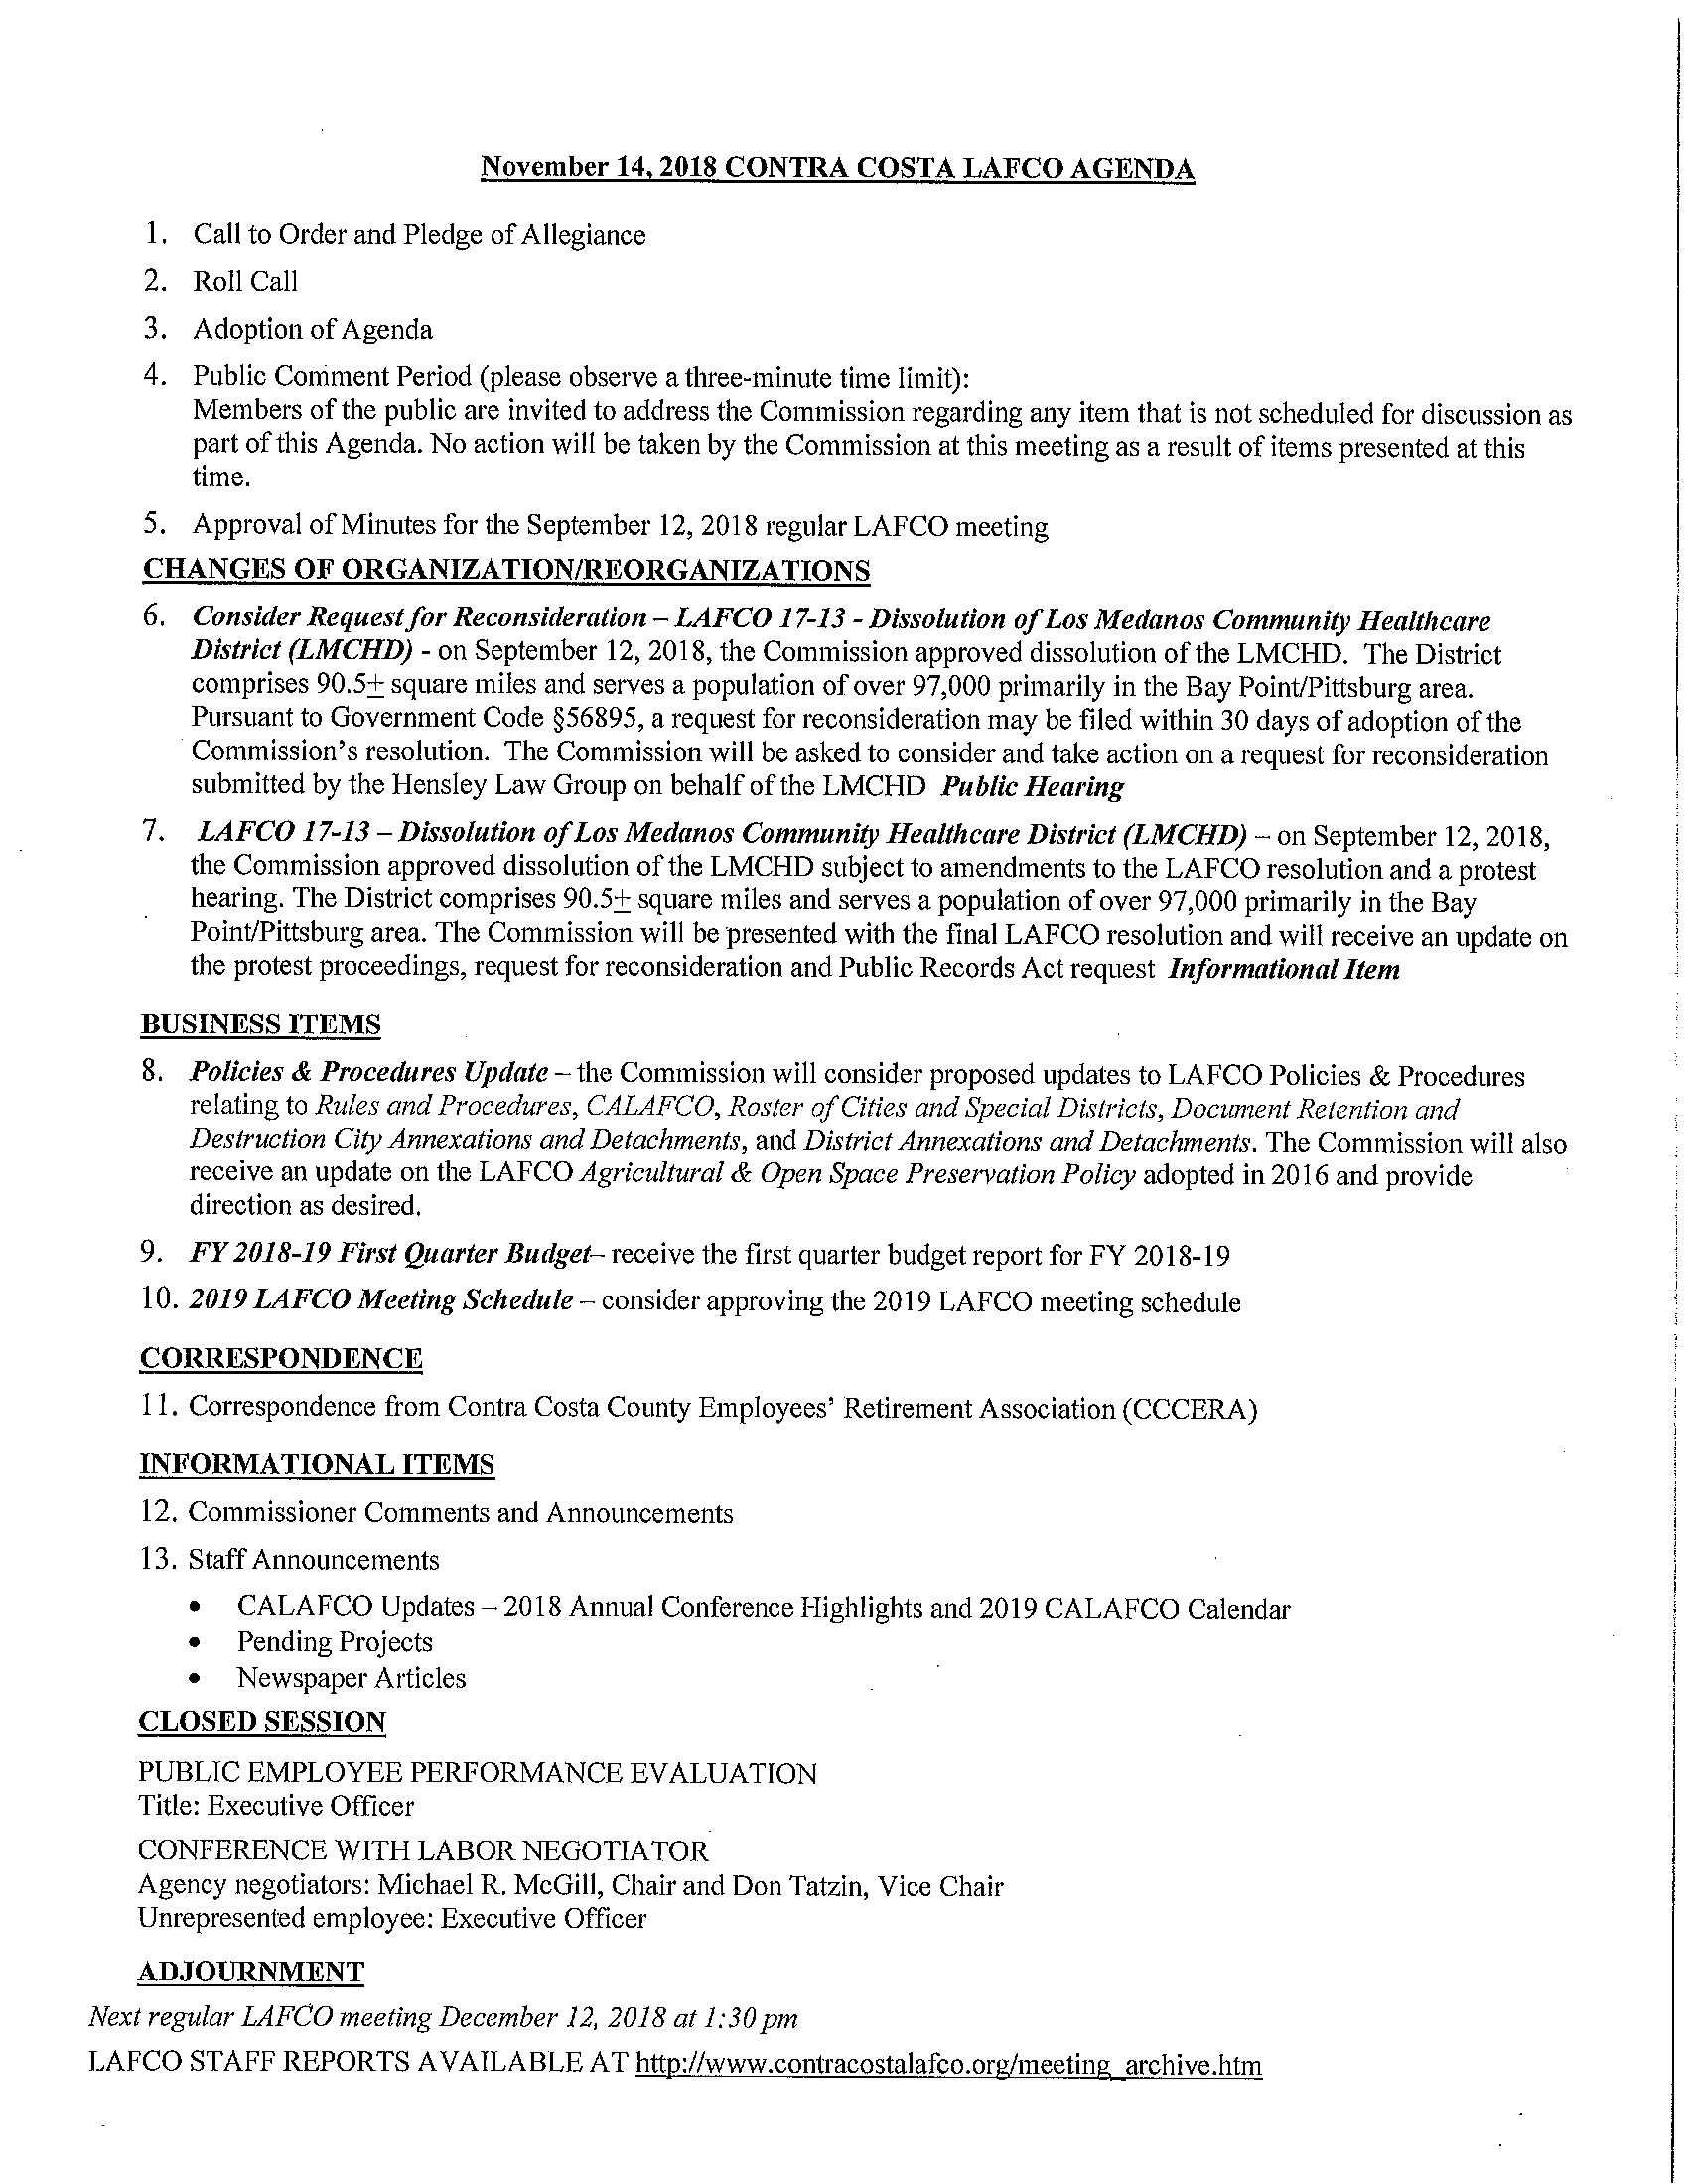 ESMAC Agenda 11.14.2018 (46 Pages)_46.jpg